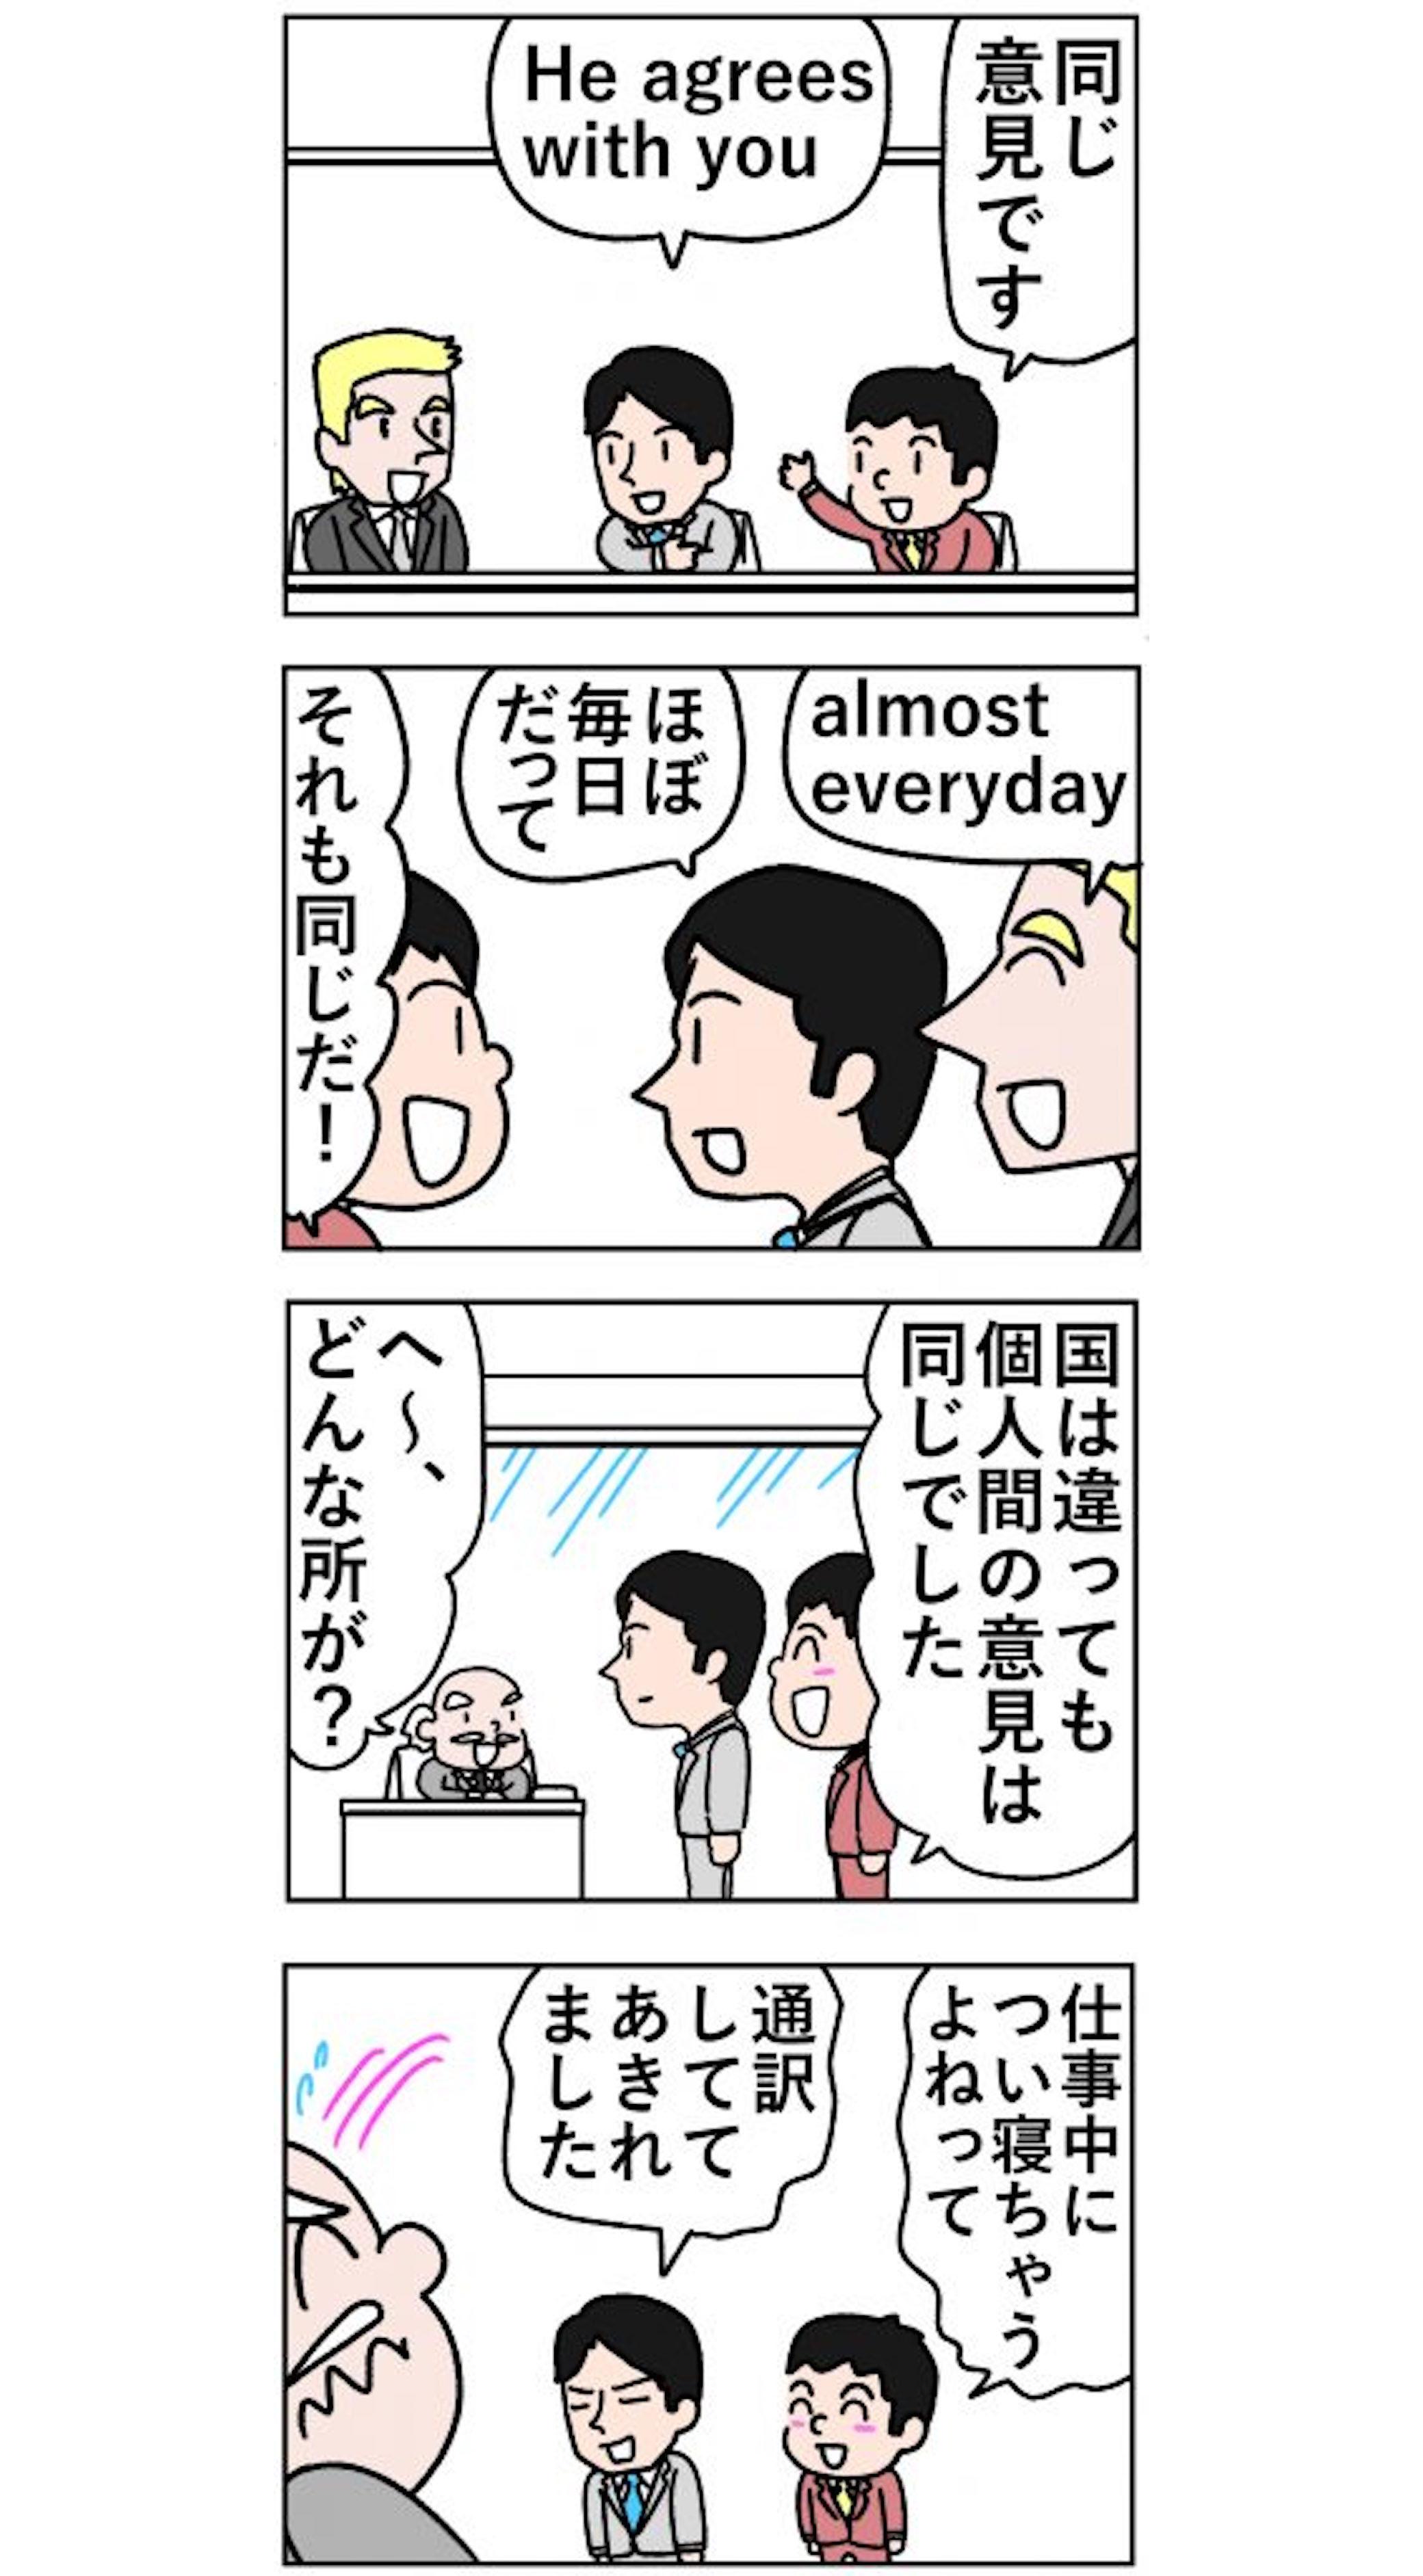 kaizen-48-348x1024